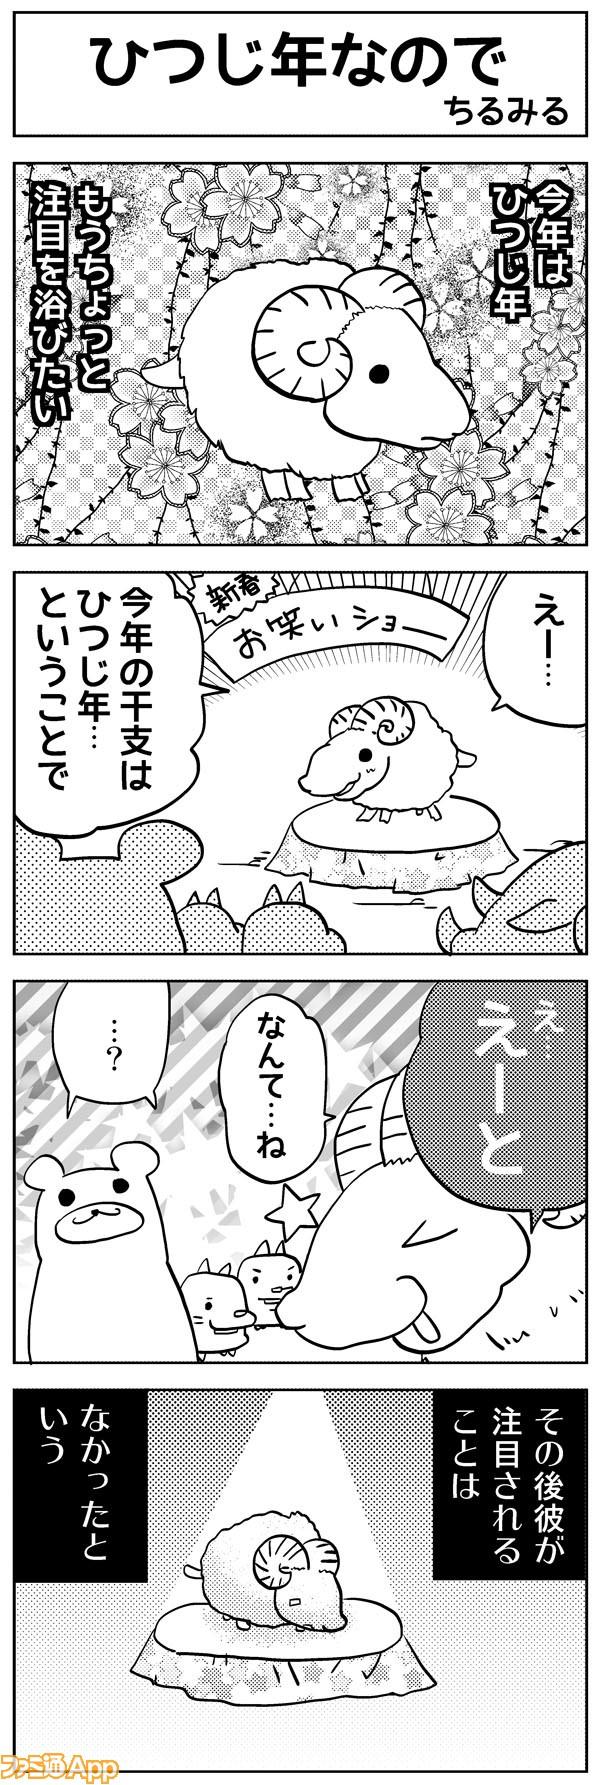 12chiru_002